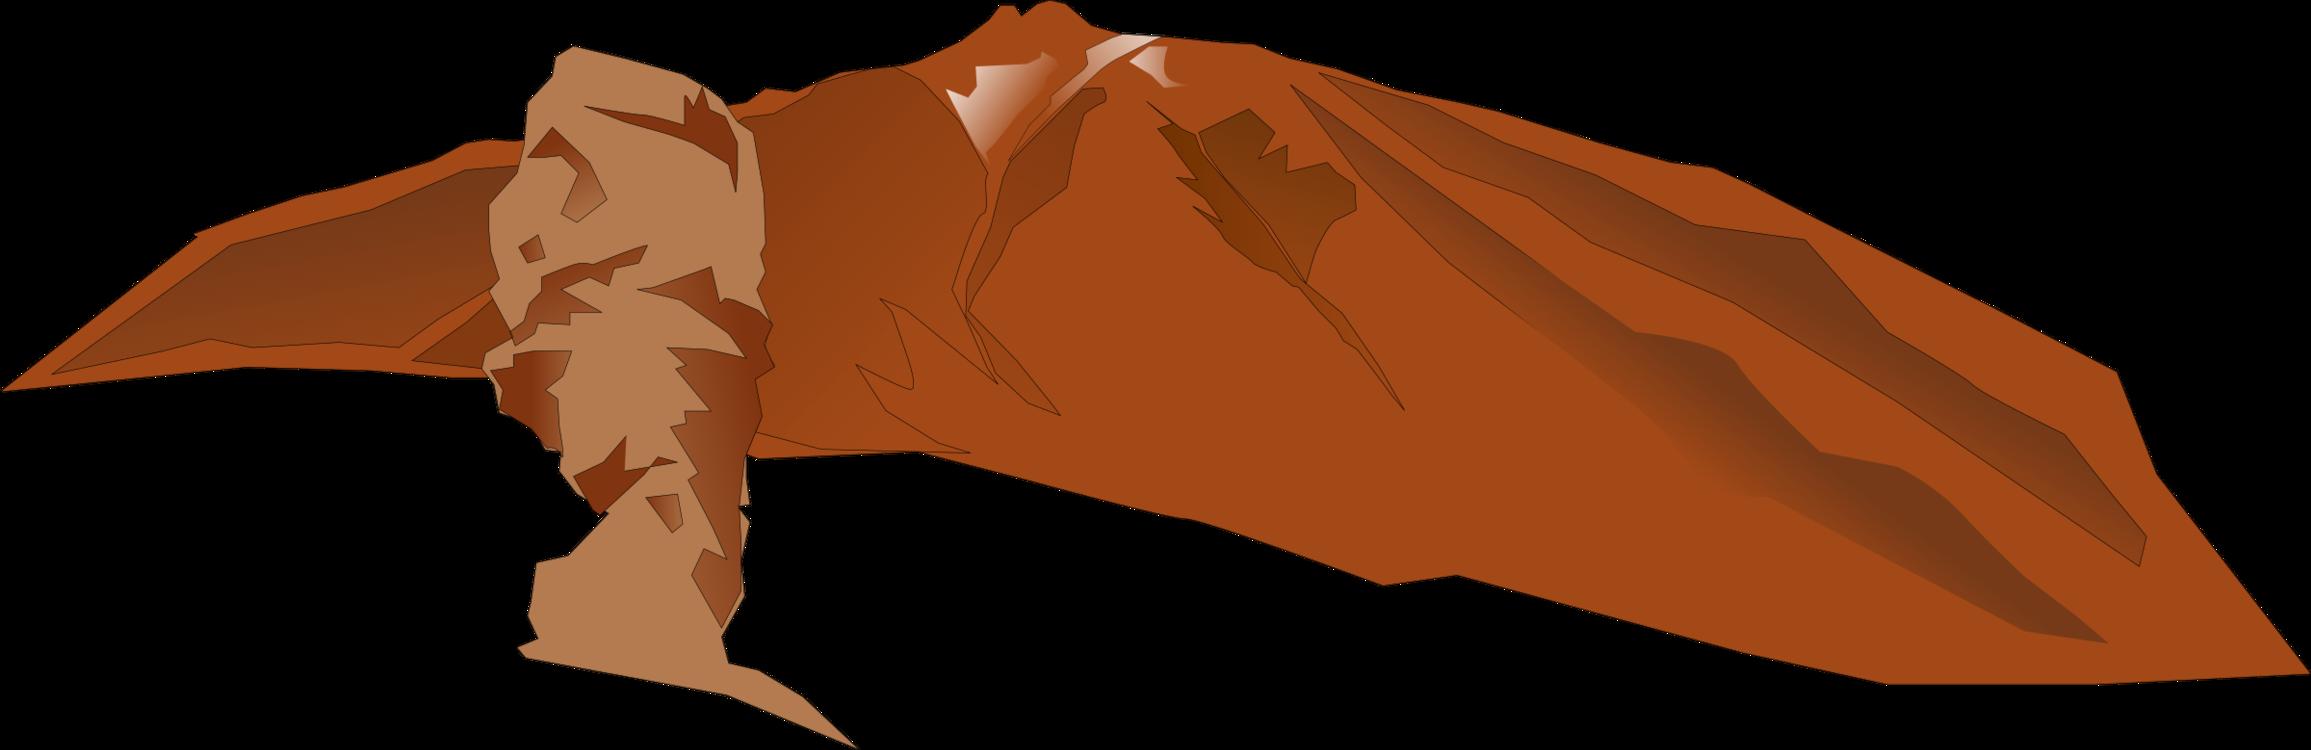 Carnivoran,Horse Like Mammal,Fictional Character